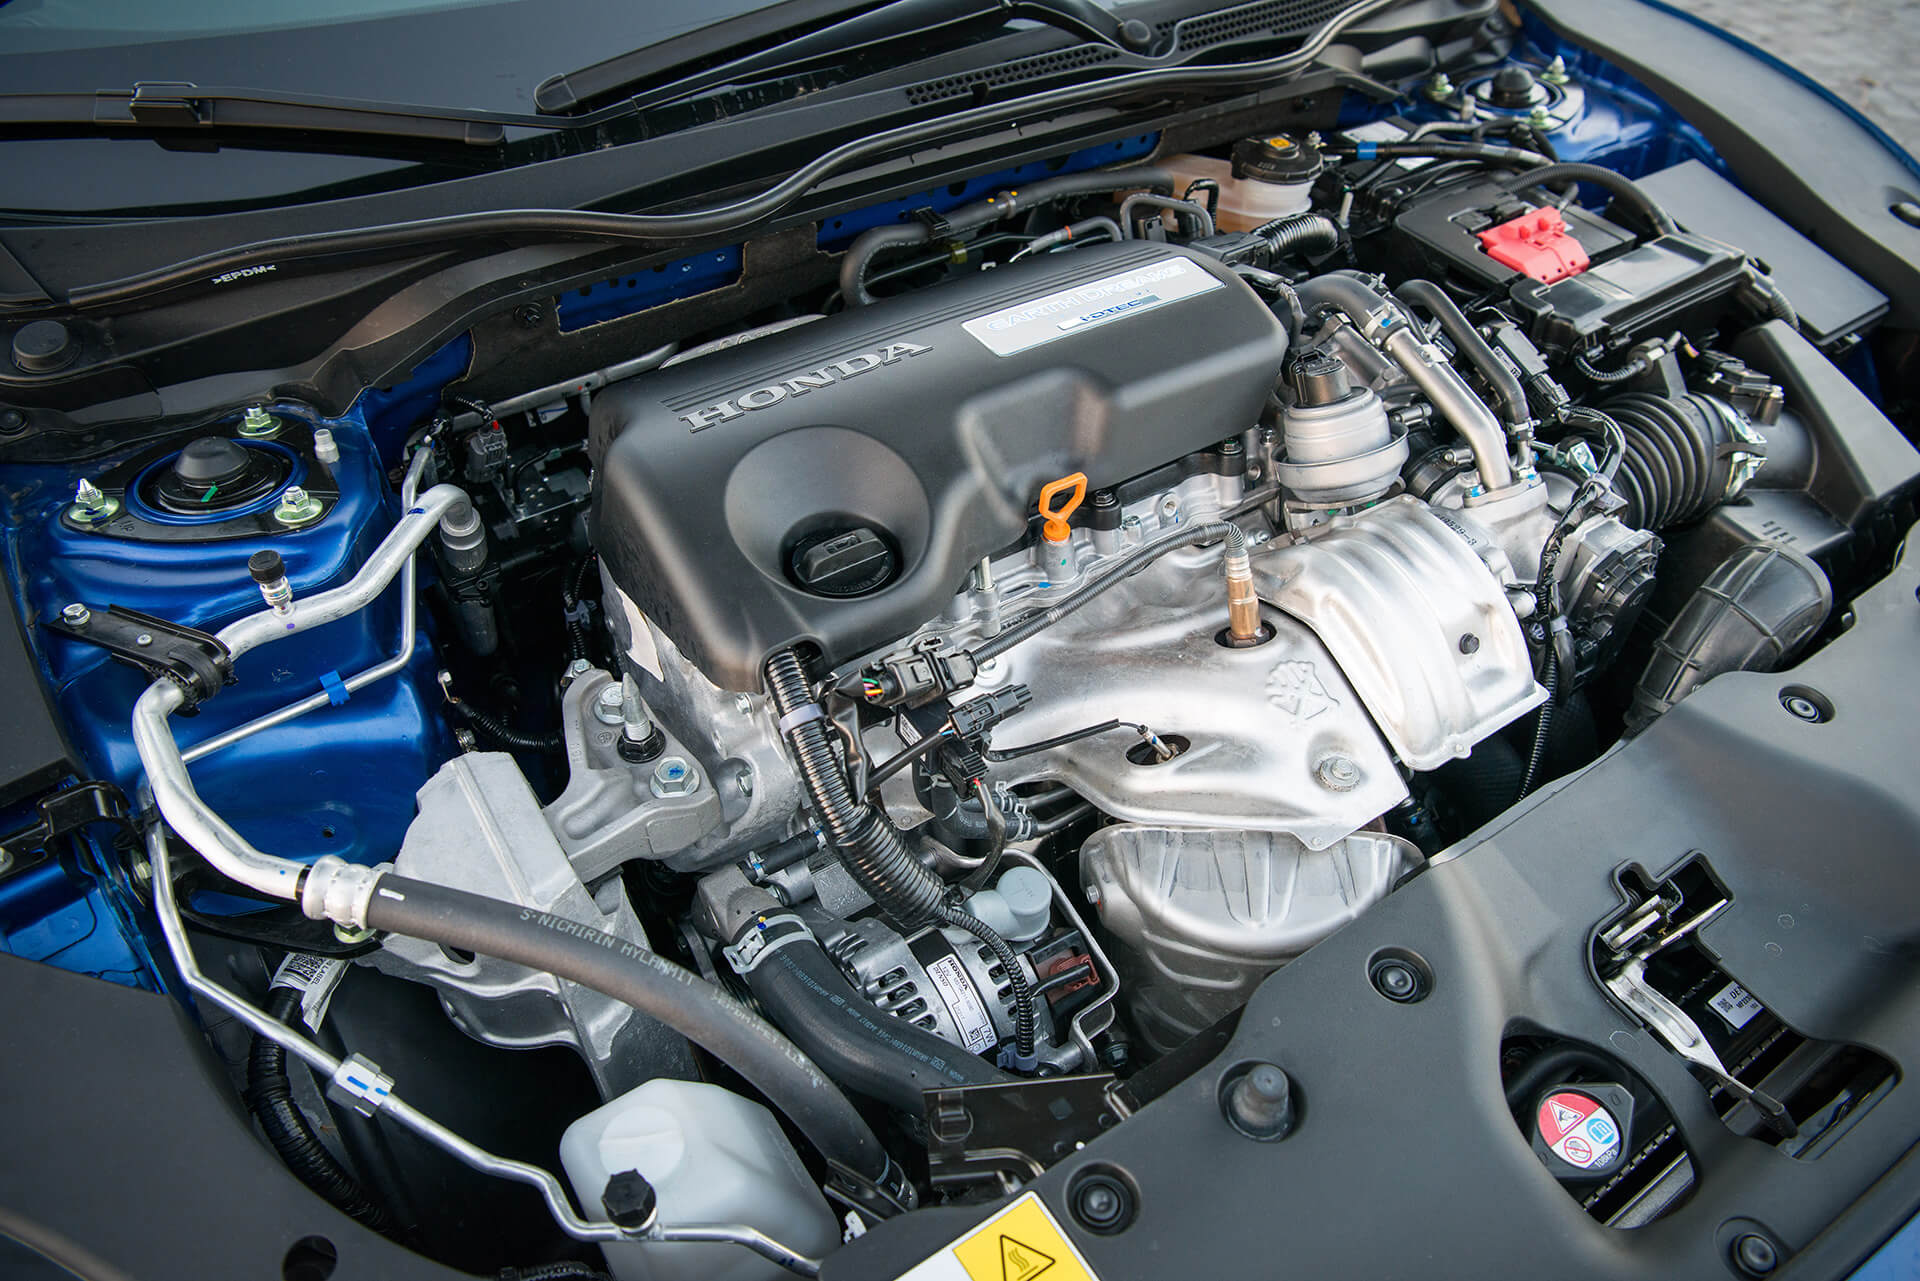 Honda Civic 1.6 i-DTEC — motor